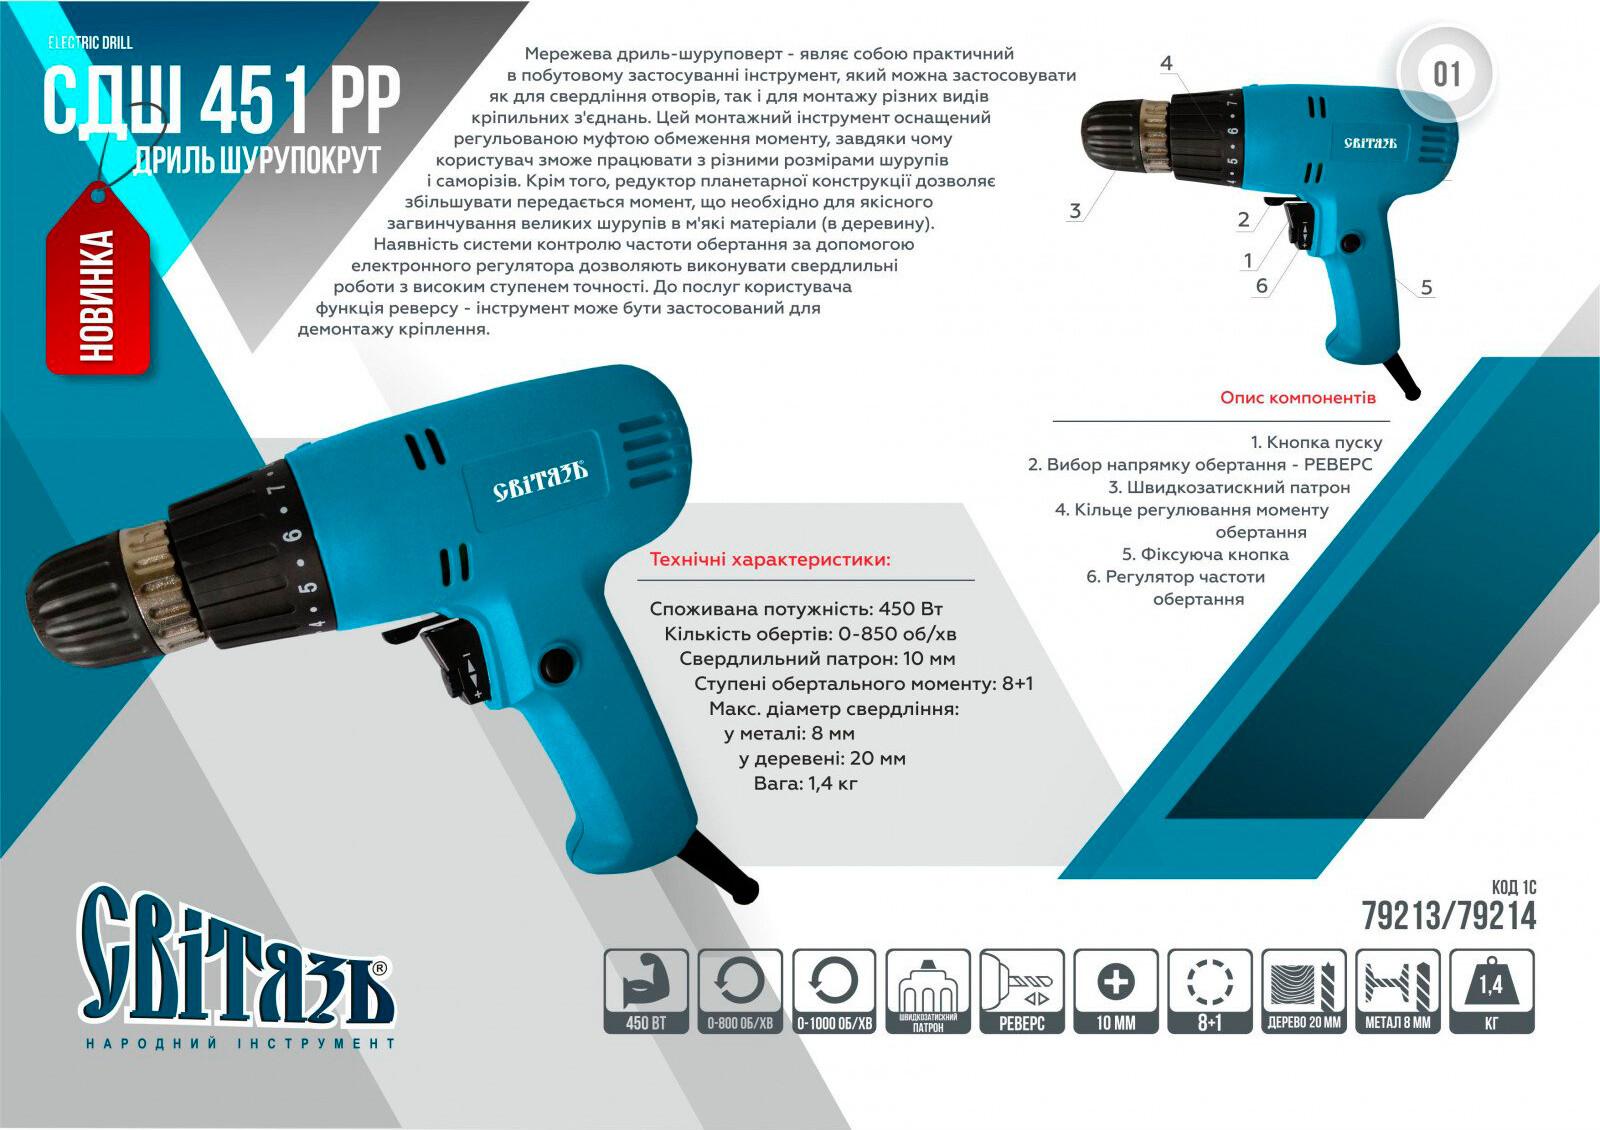 https://papam.com.ua/product/drel-shurupovert-svytyaz-sdsh-451-rr-400-vt/